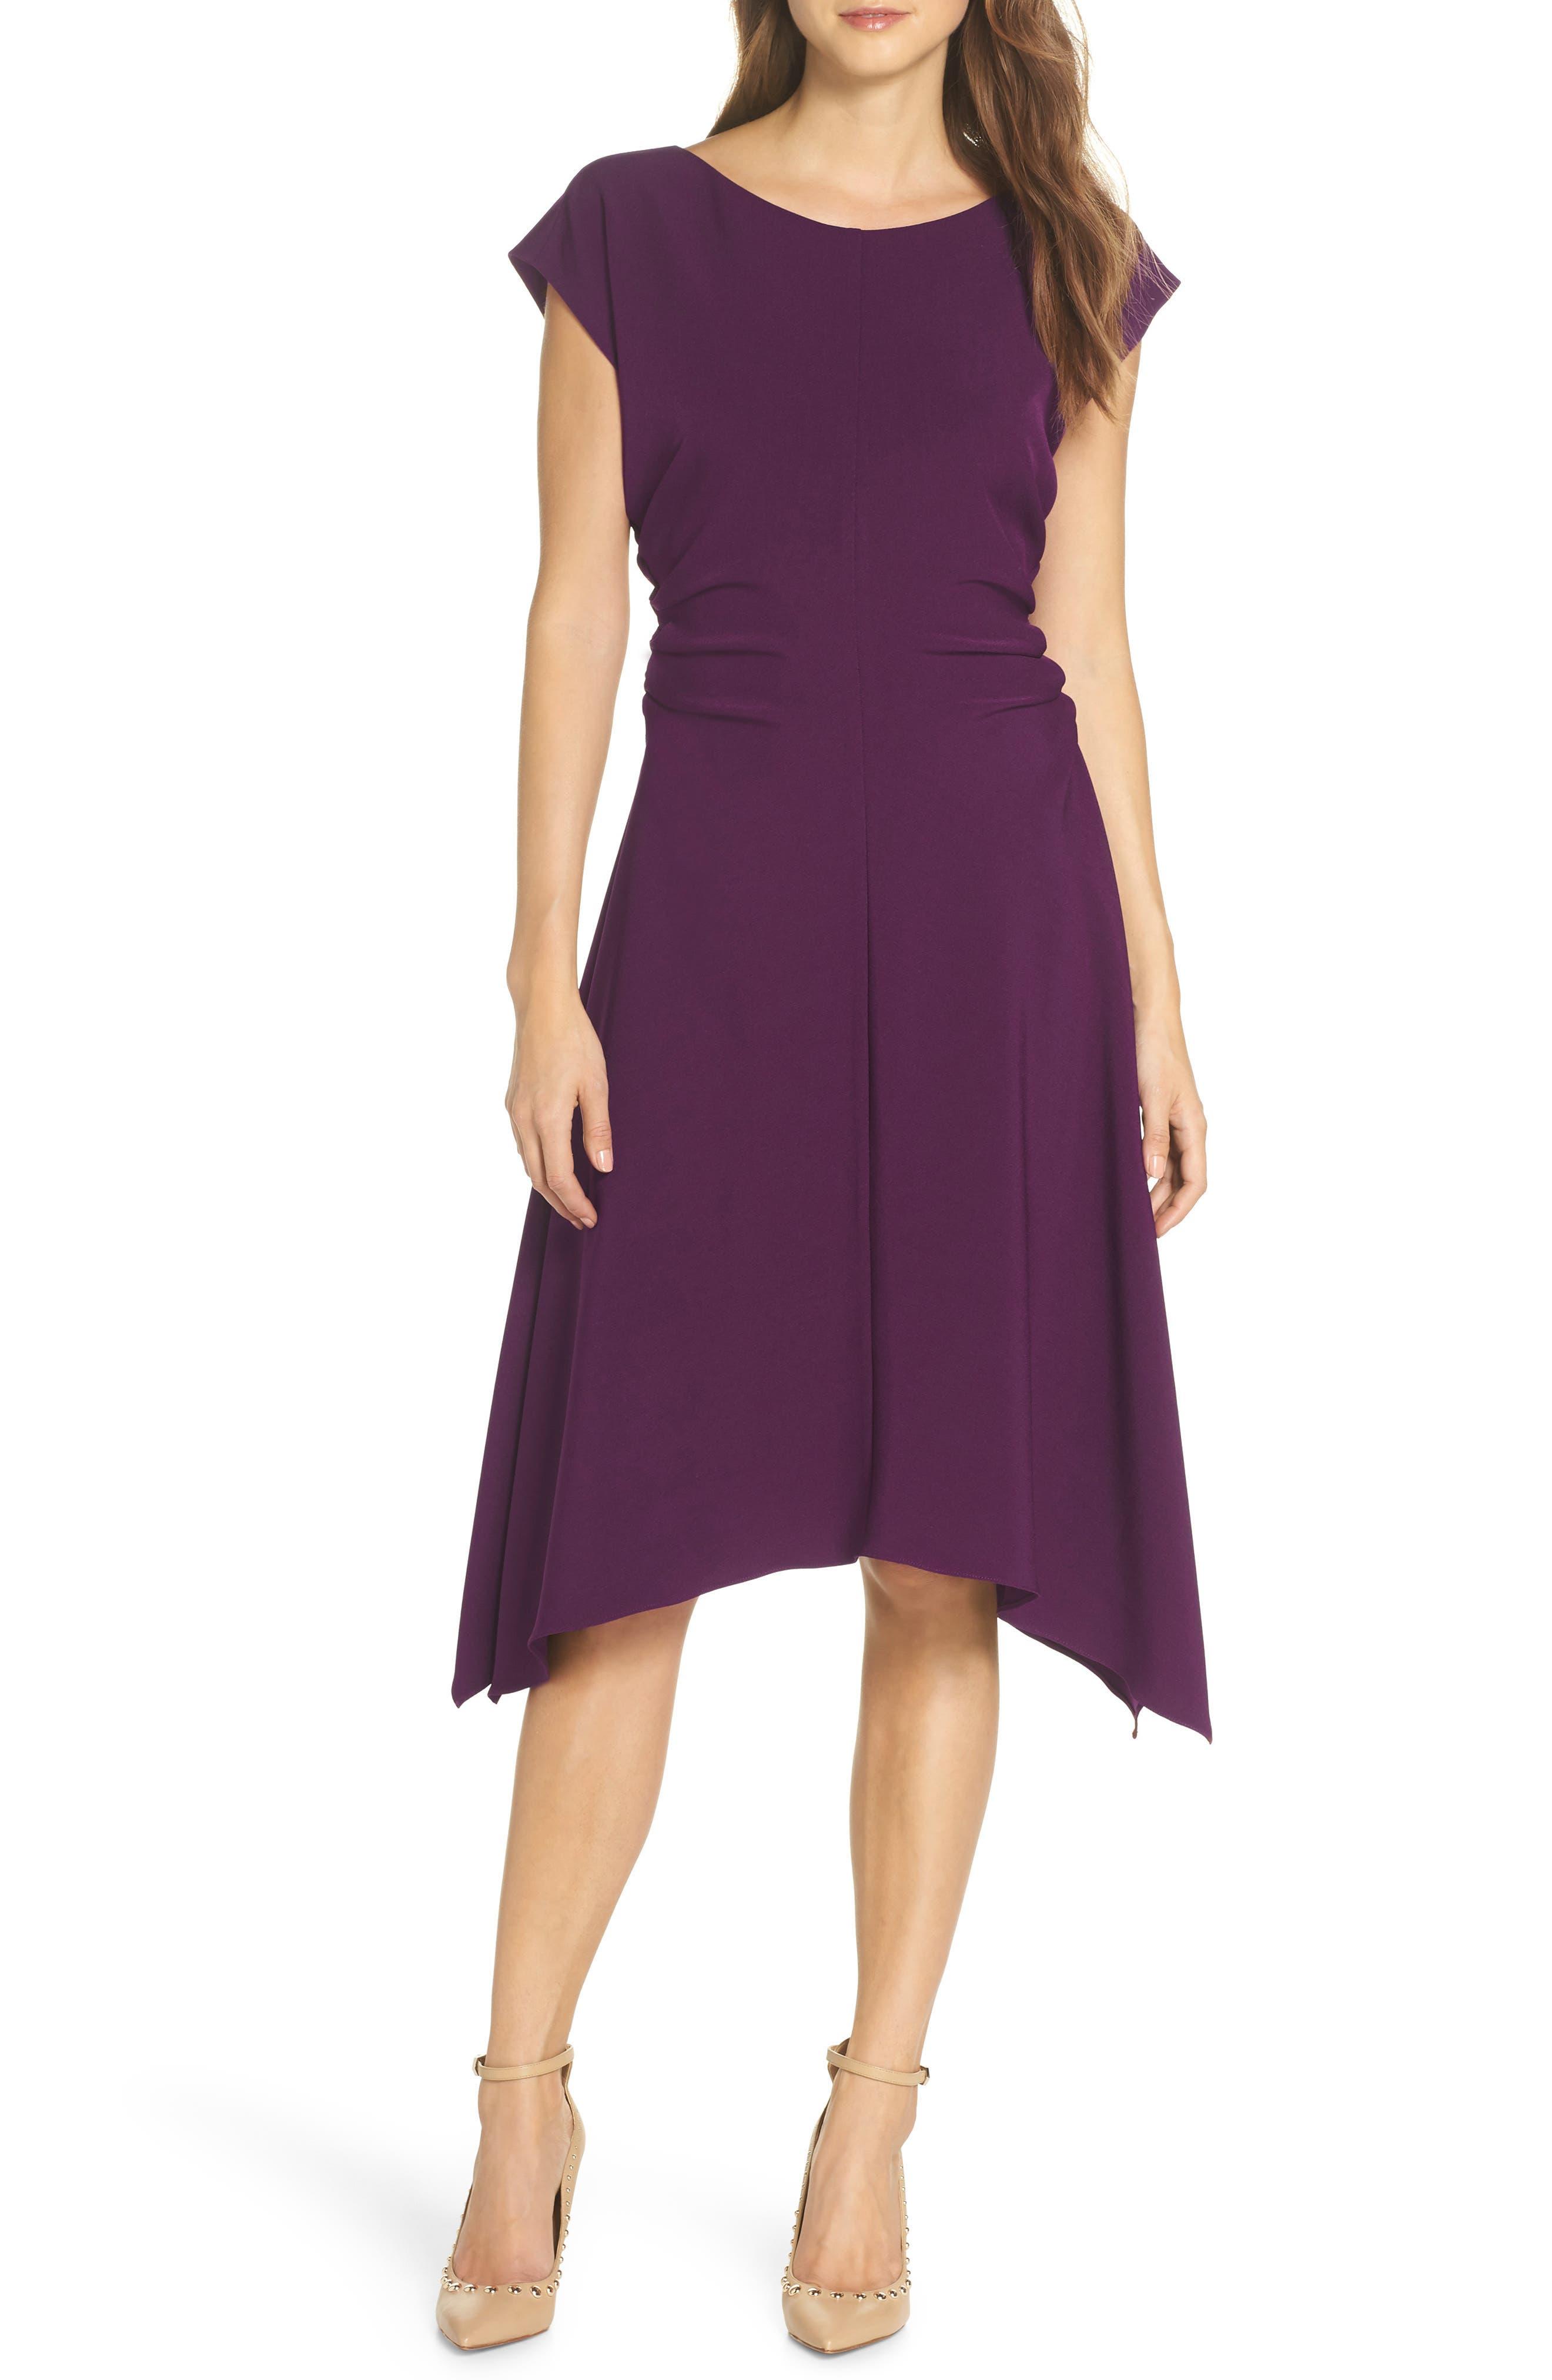 JULIA JORDAN,                             Ruched Stretch Crepe Fit & Flare Dress,                             Main thumbnail 1, color,                             PLUM